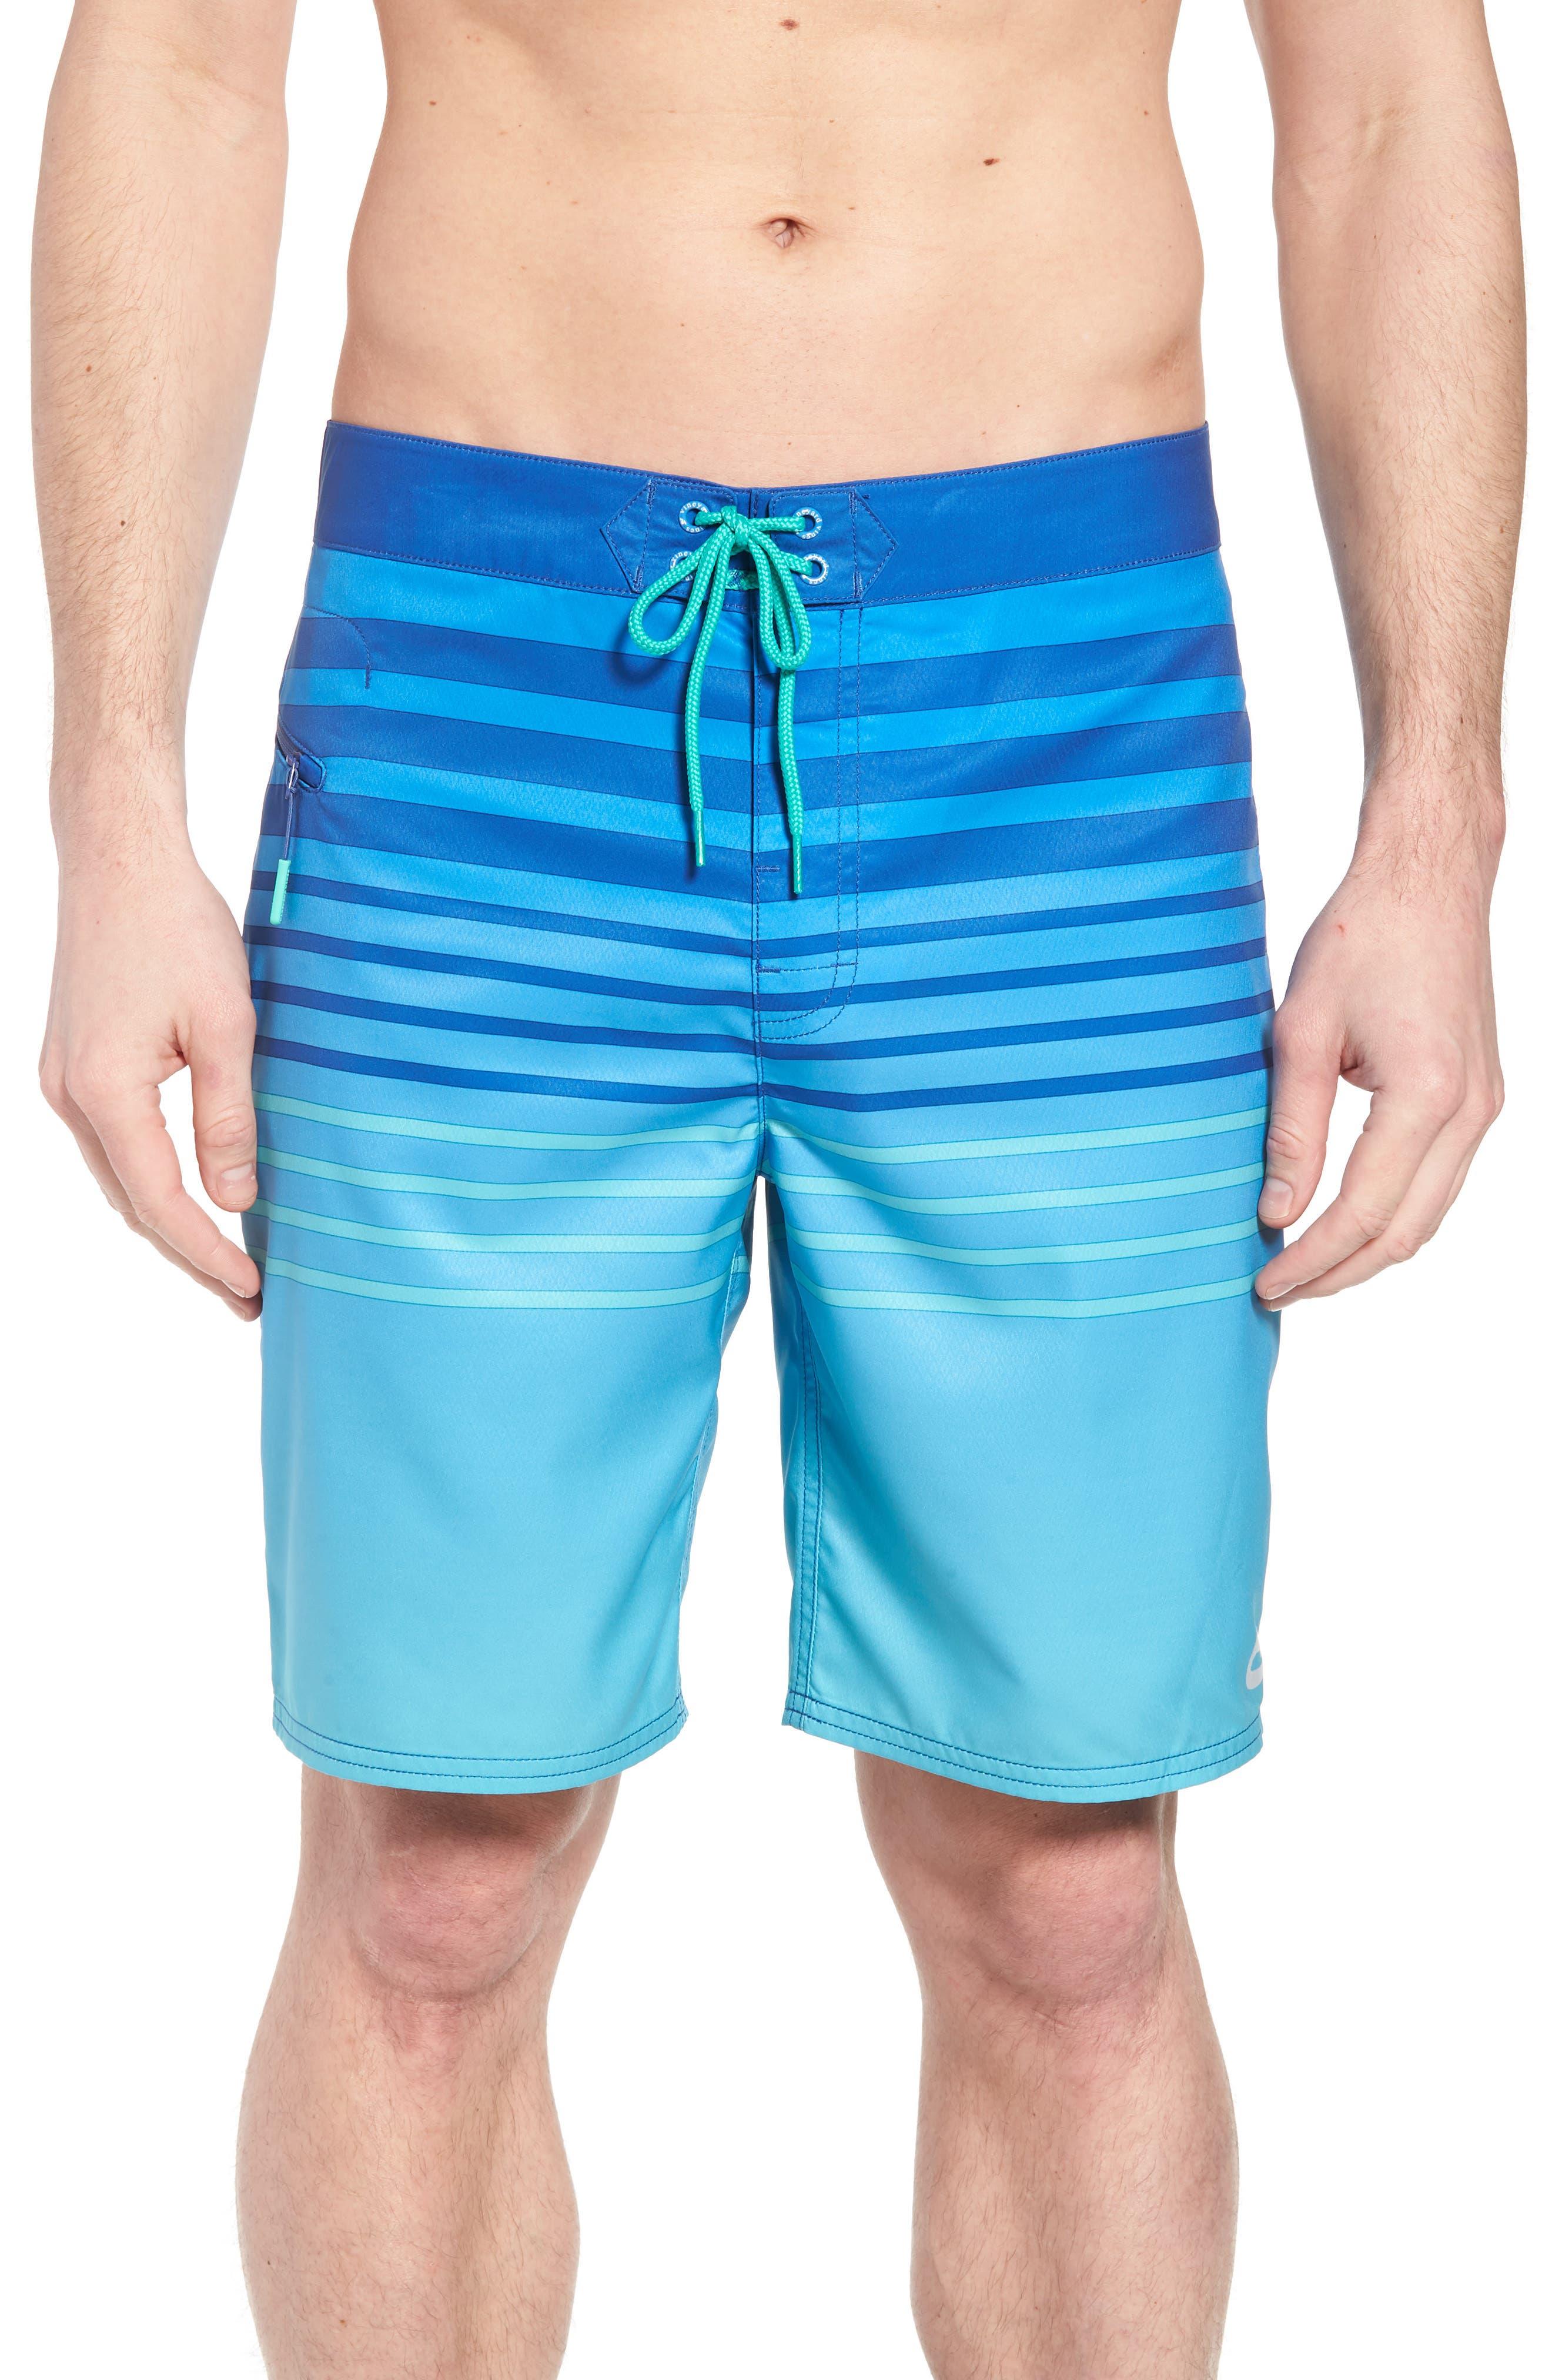 Surflodge Stripe Board Shorts,                             Main thumbnail 1, color,                             359